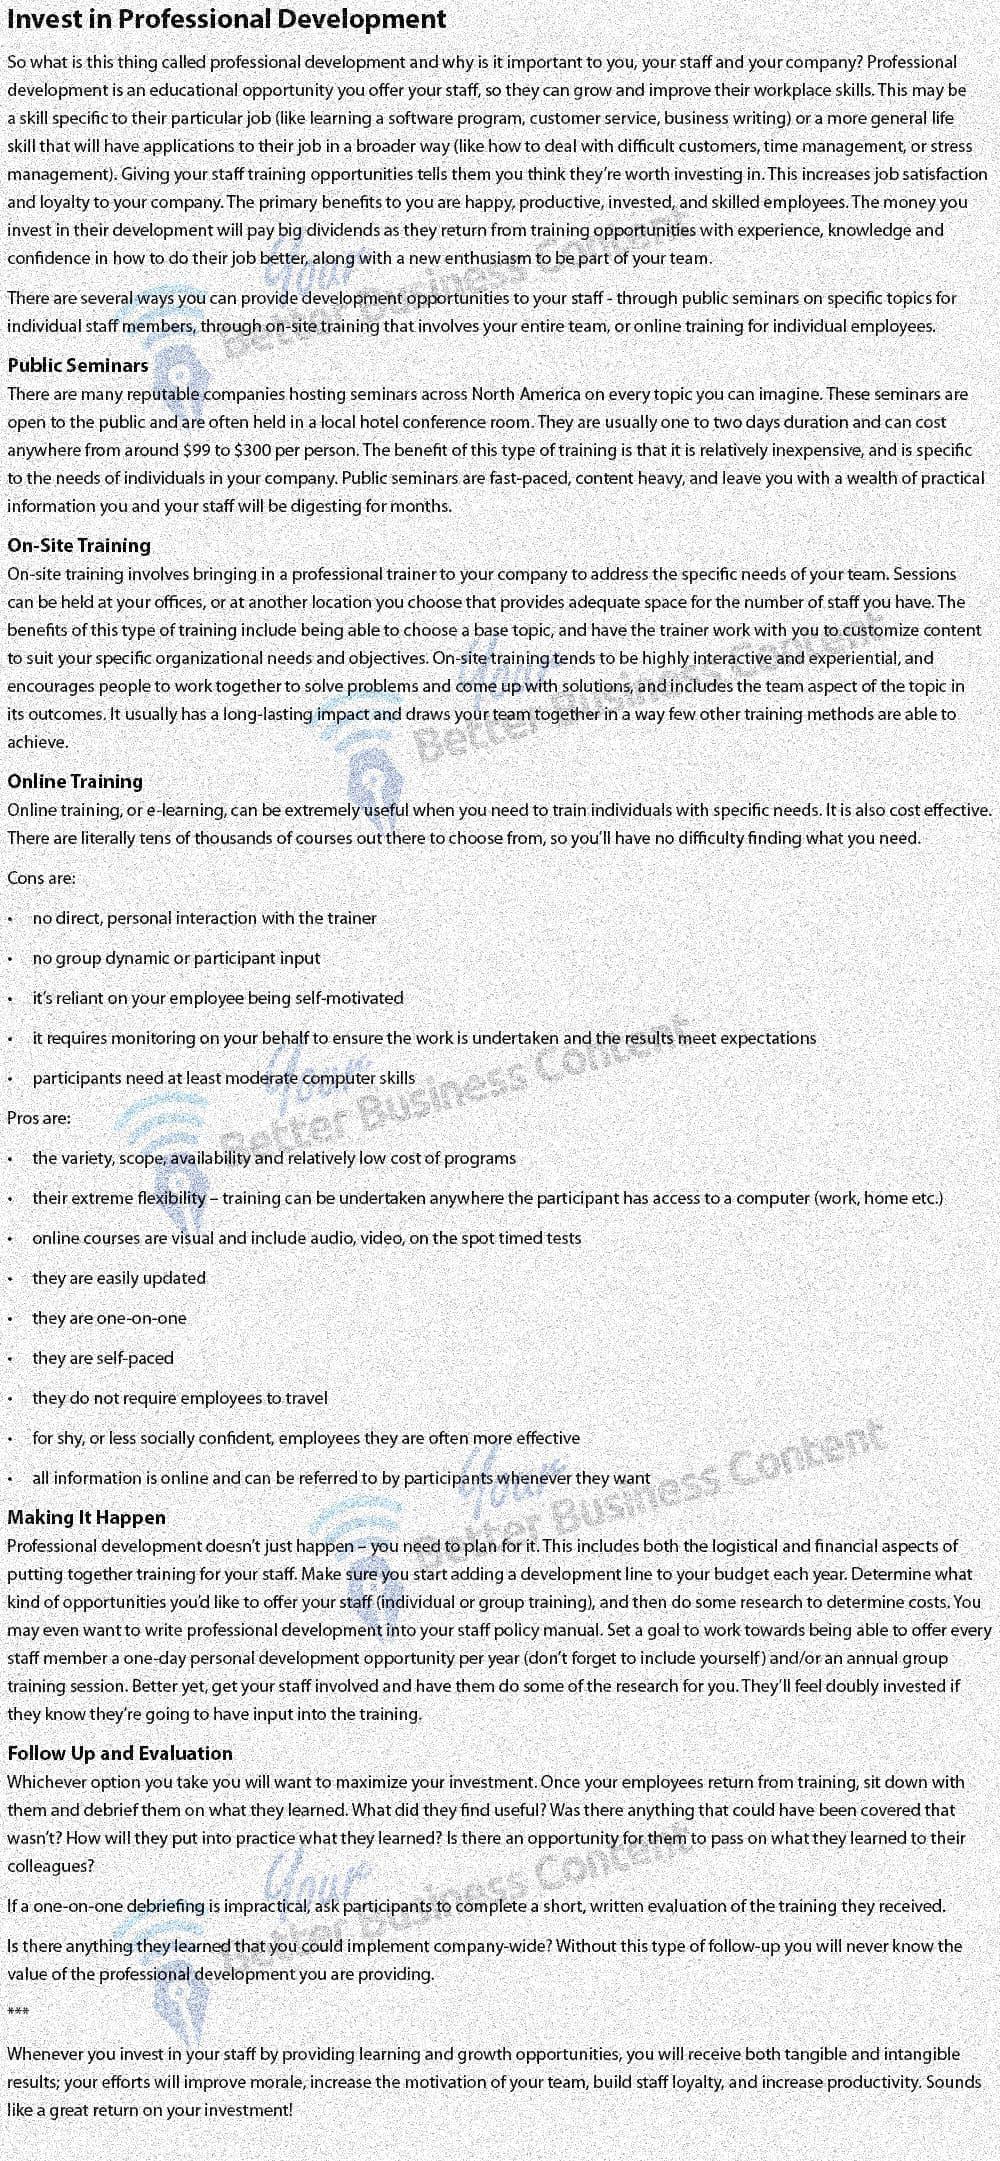 hr-11-16-016-professional-development